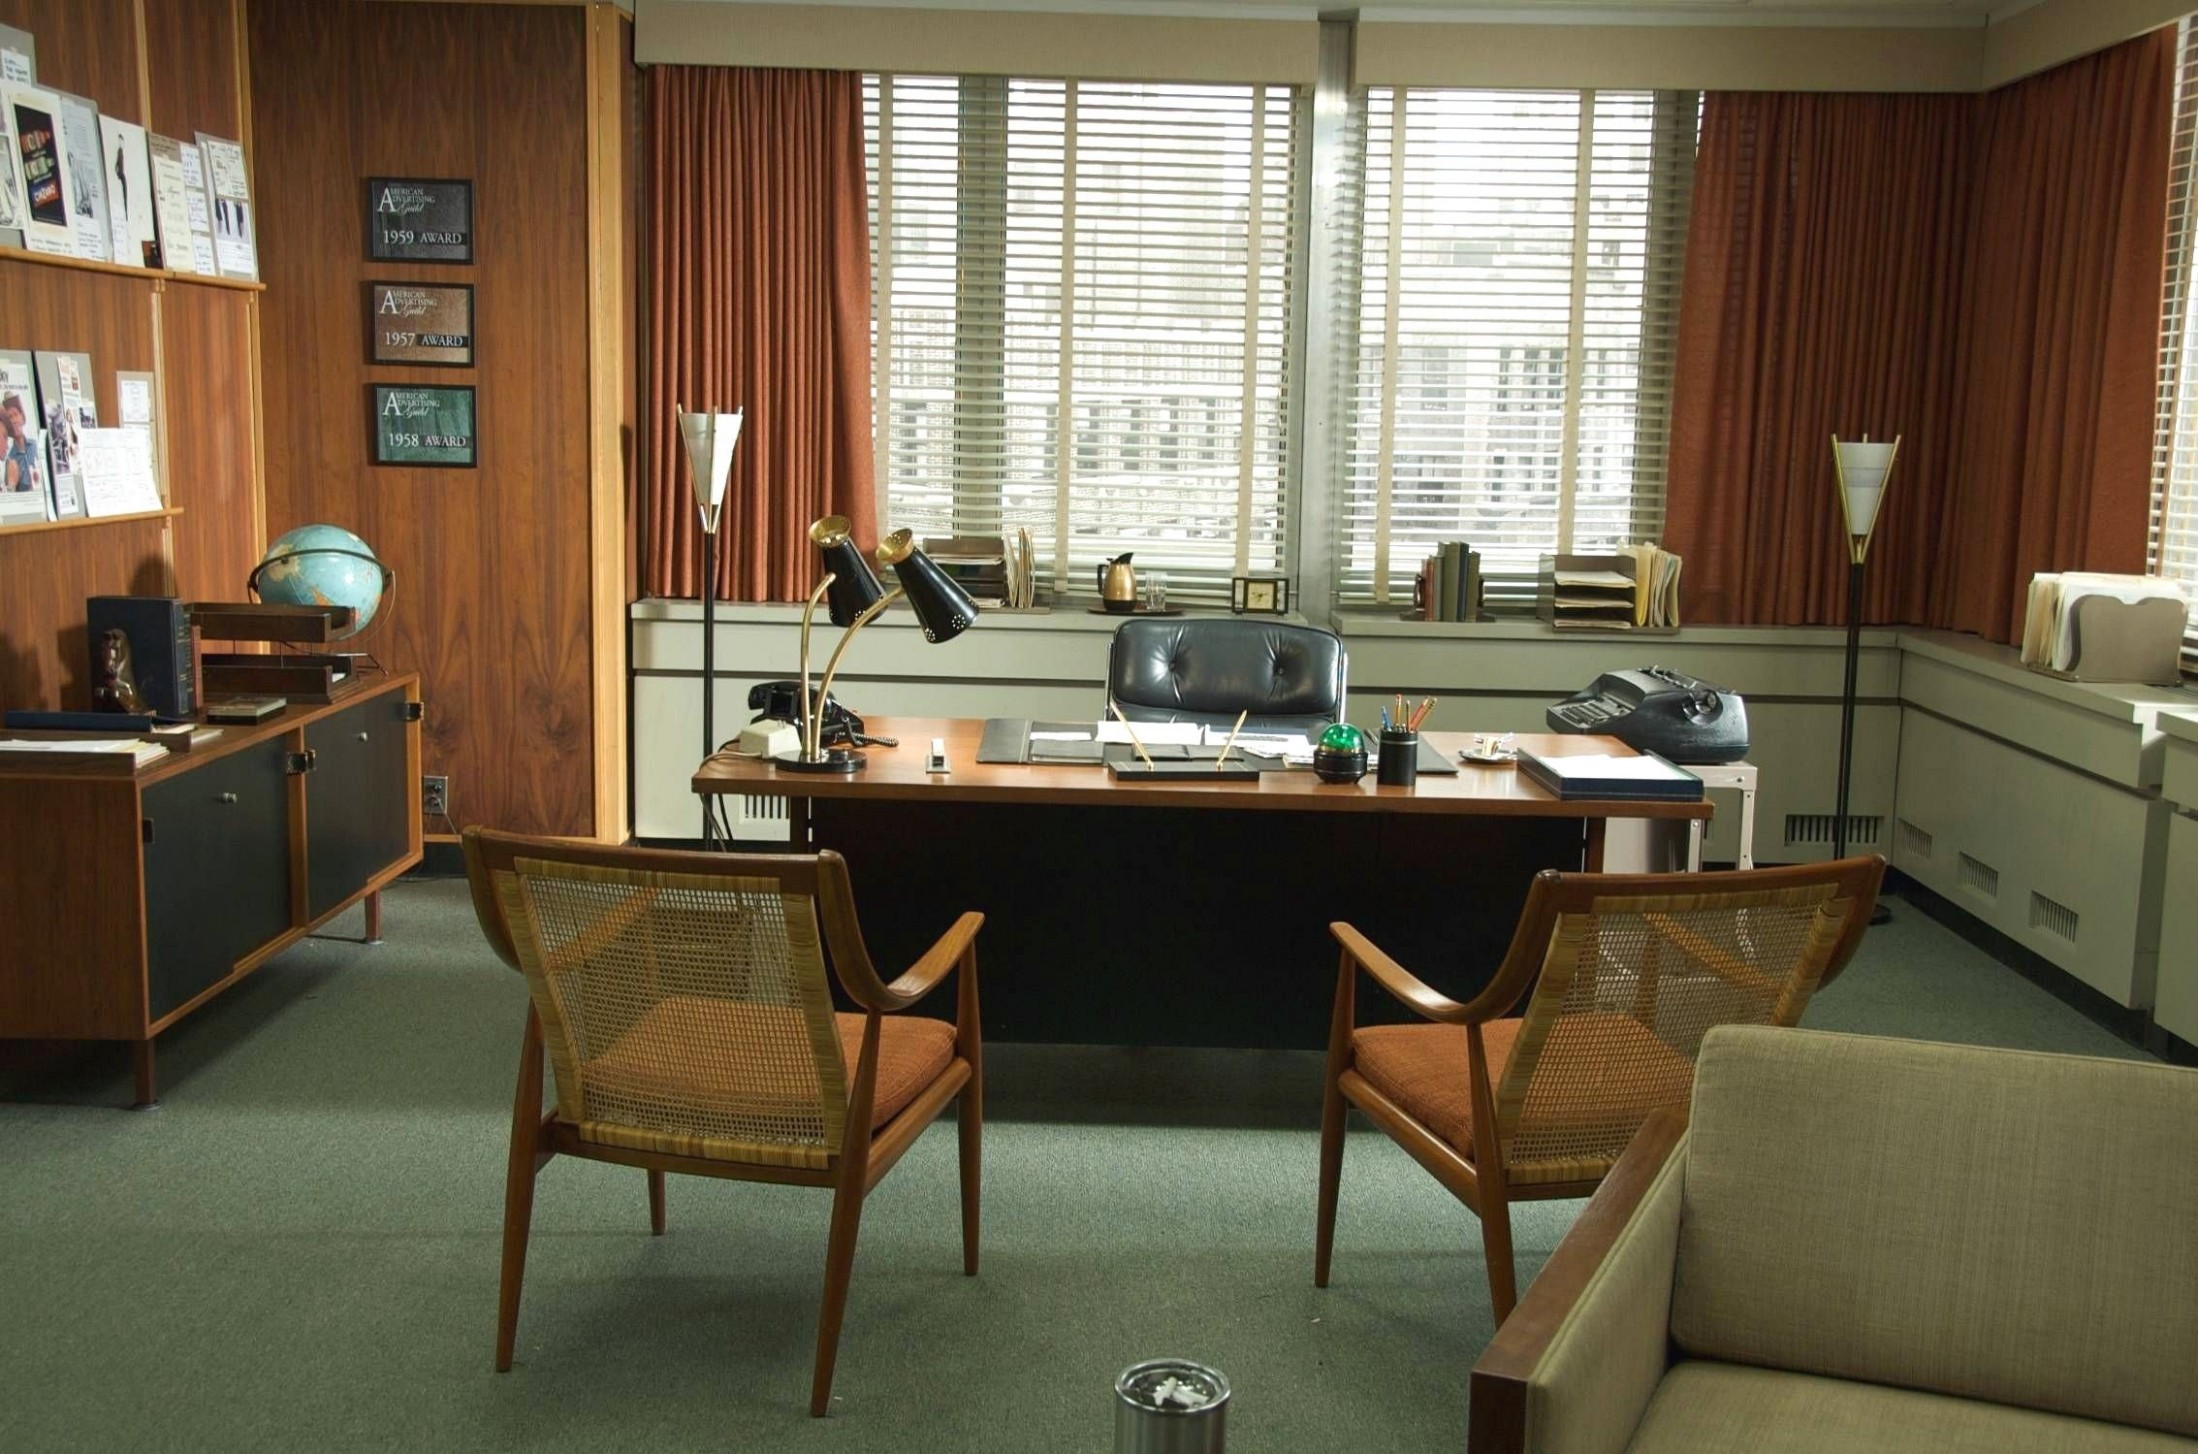 9x9 home office ideas  Mad men interior design, Mad men  - 10X10 Home Office Ideas